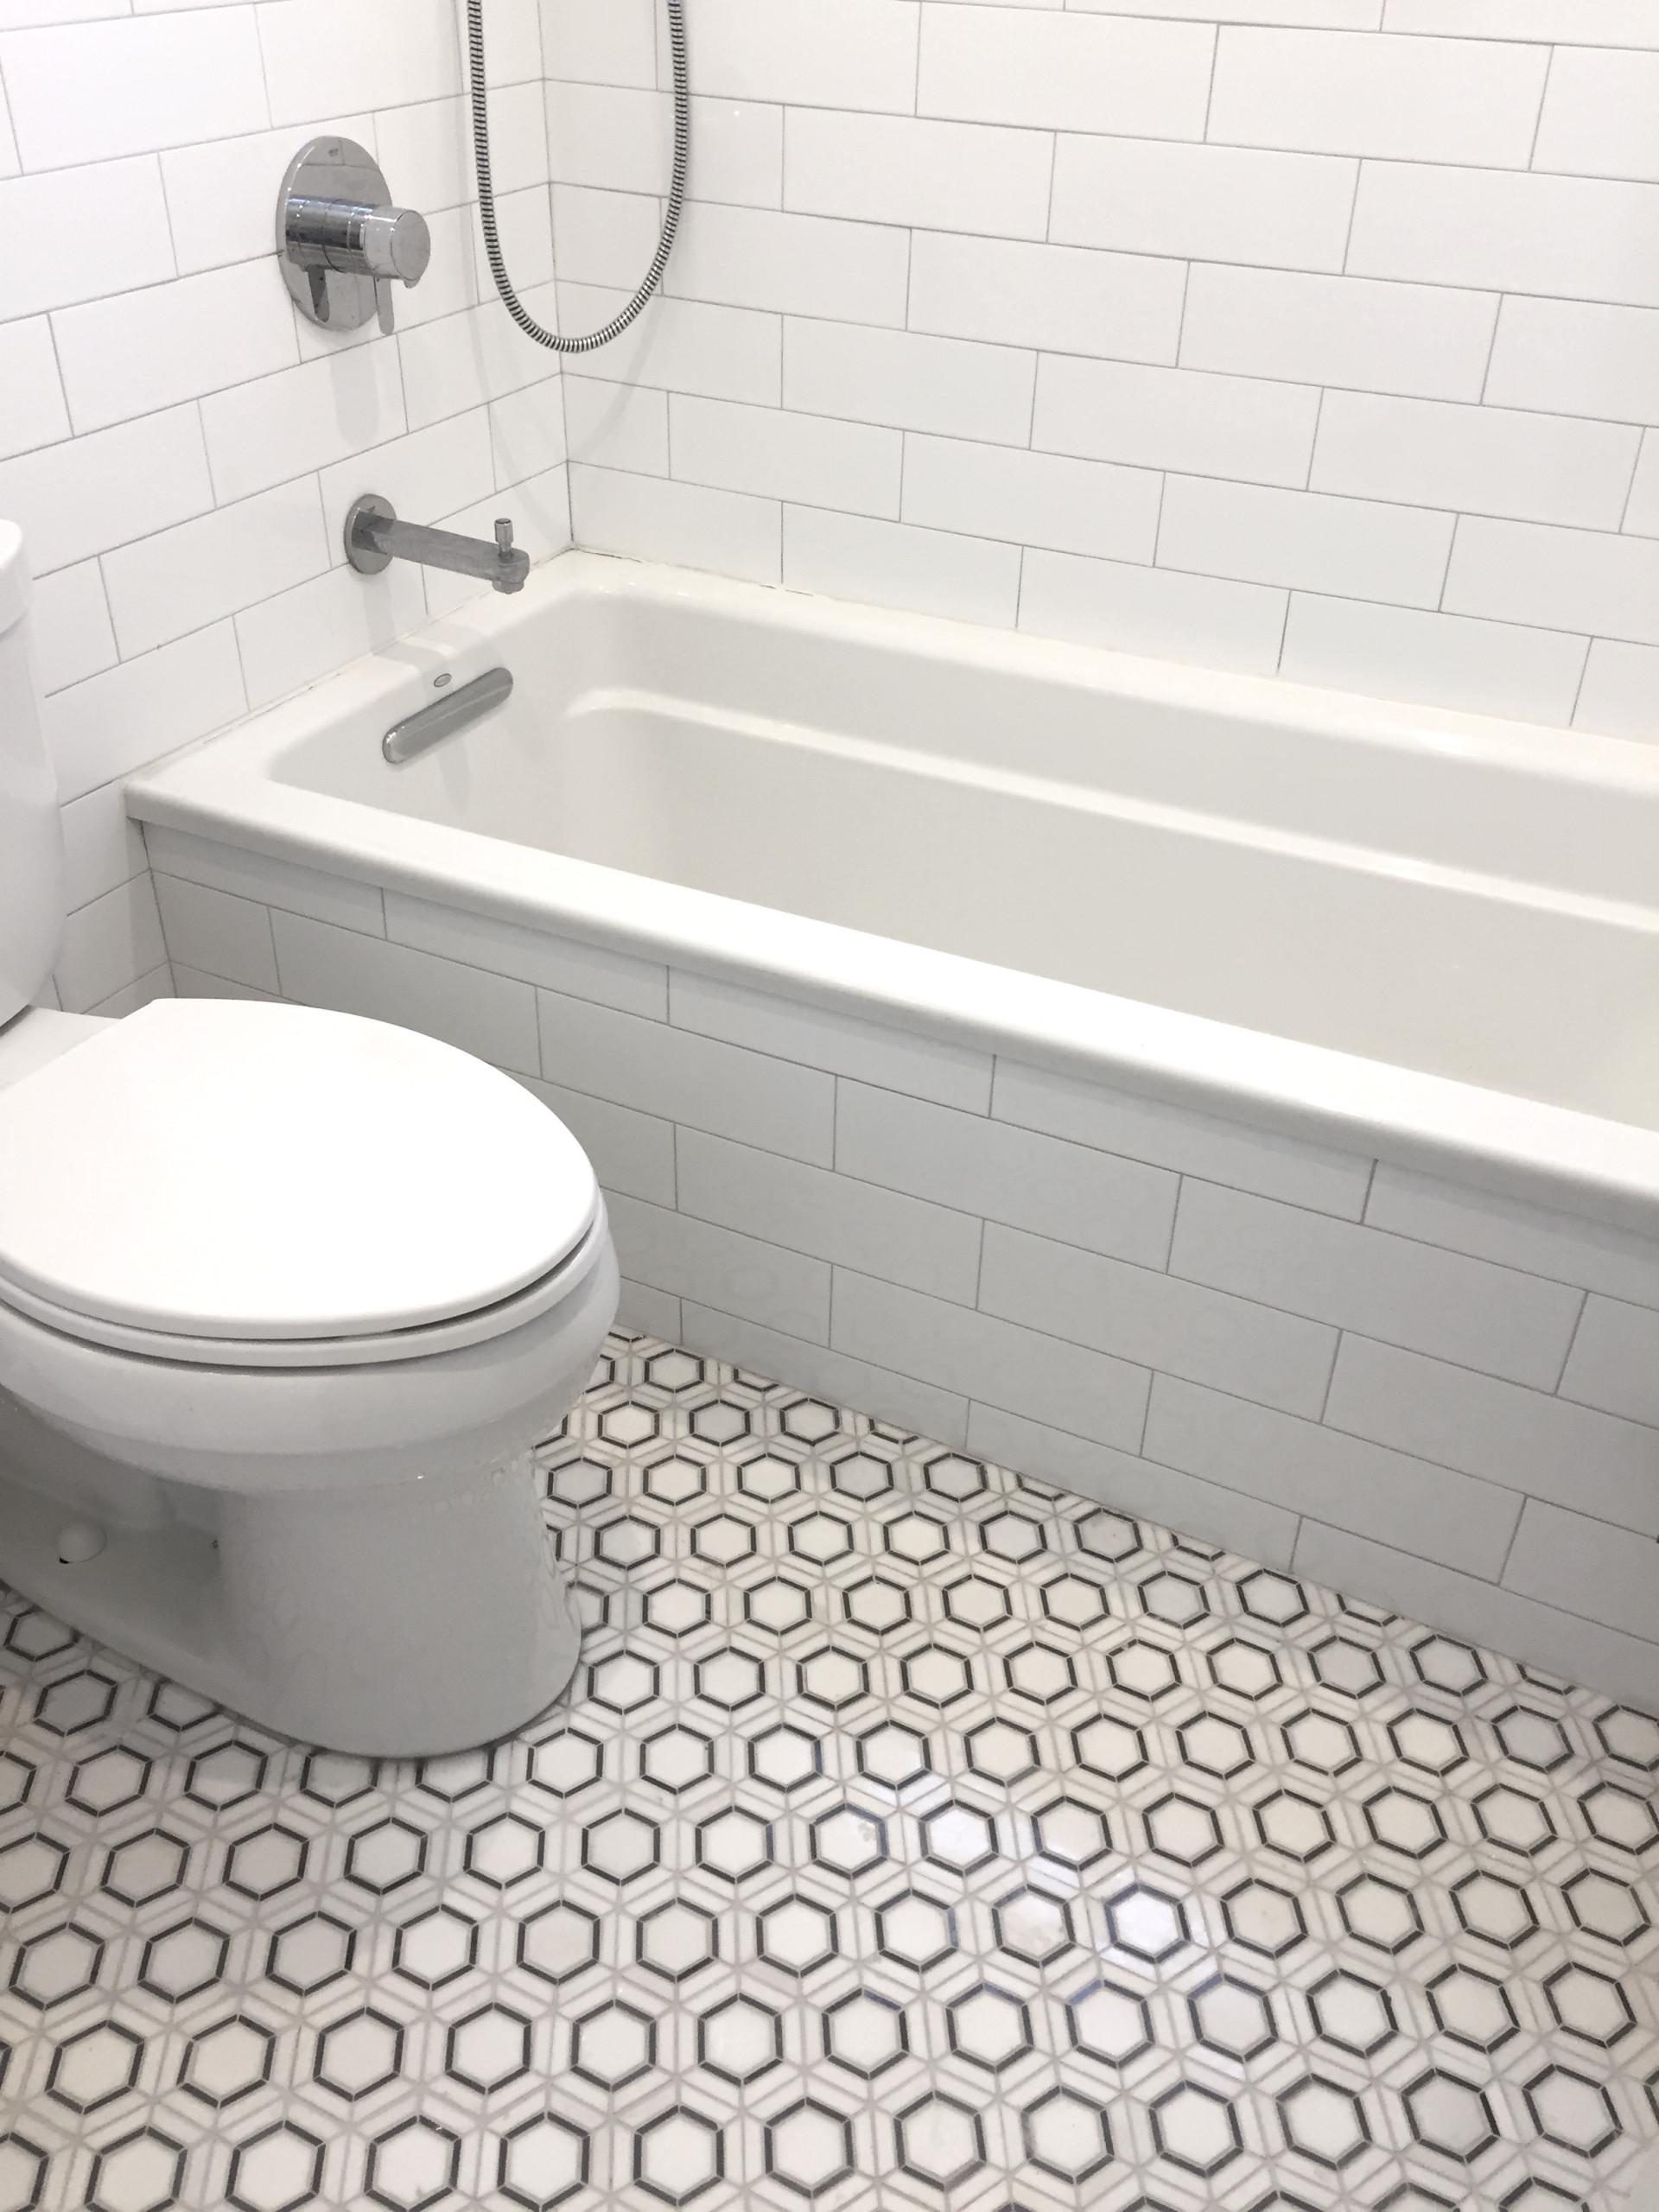 Jersey City Rowhouse Bath